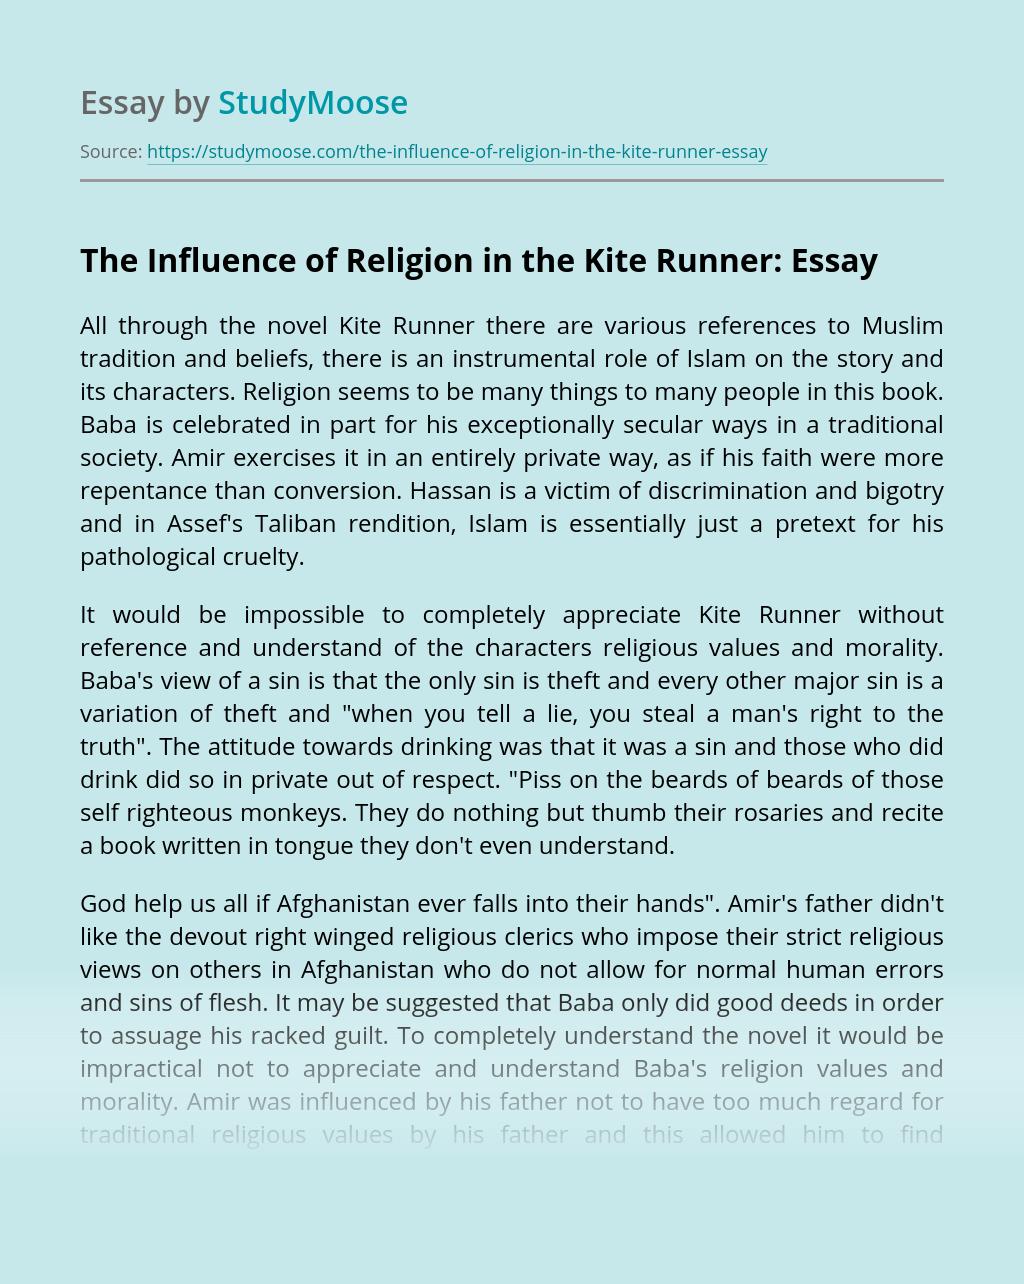 The Influence of Religion in the Kite Runner: